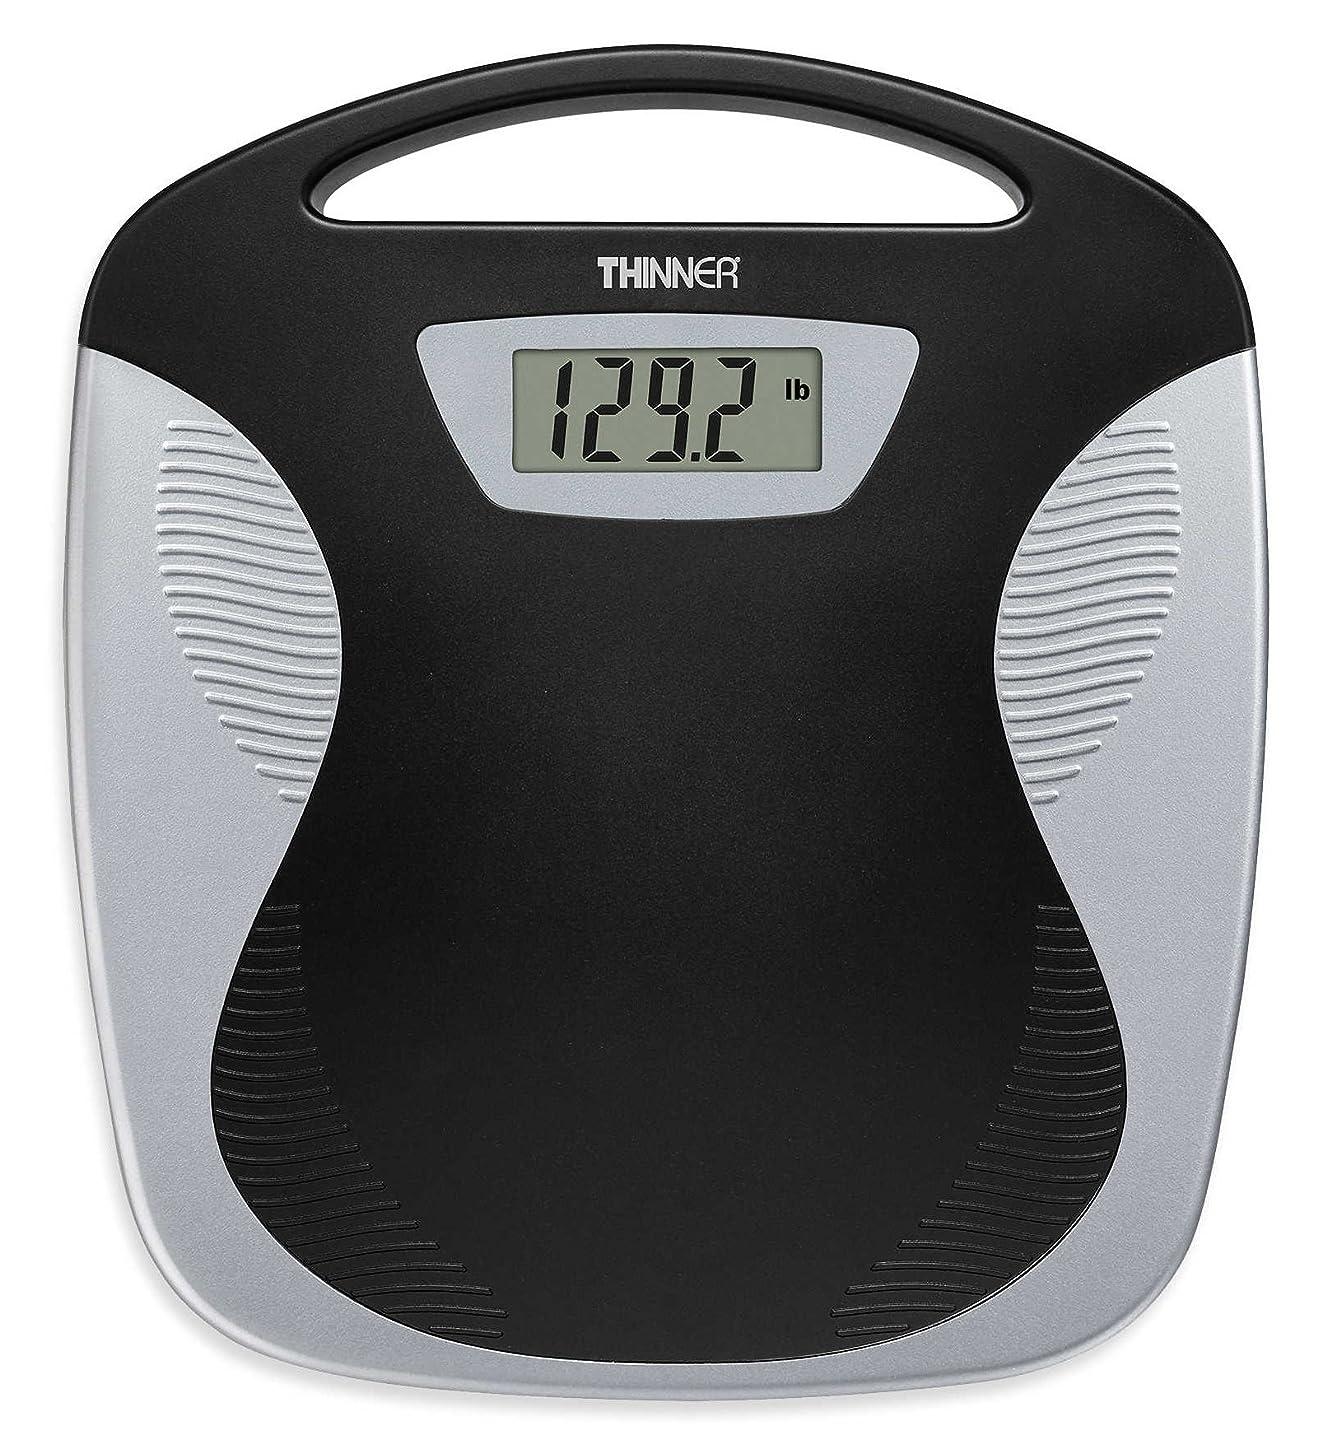 Conair Thinner TH280 Digital Precision LED Portable Bathroom Scale, Black/Silver